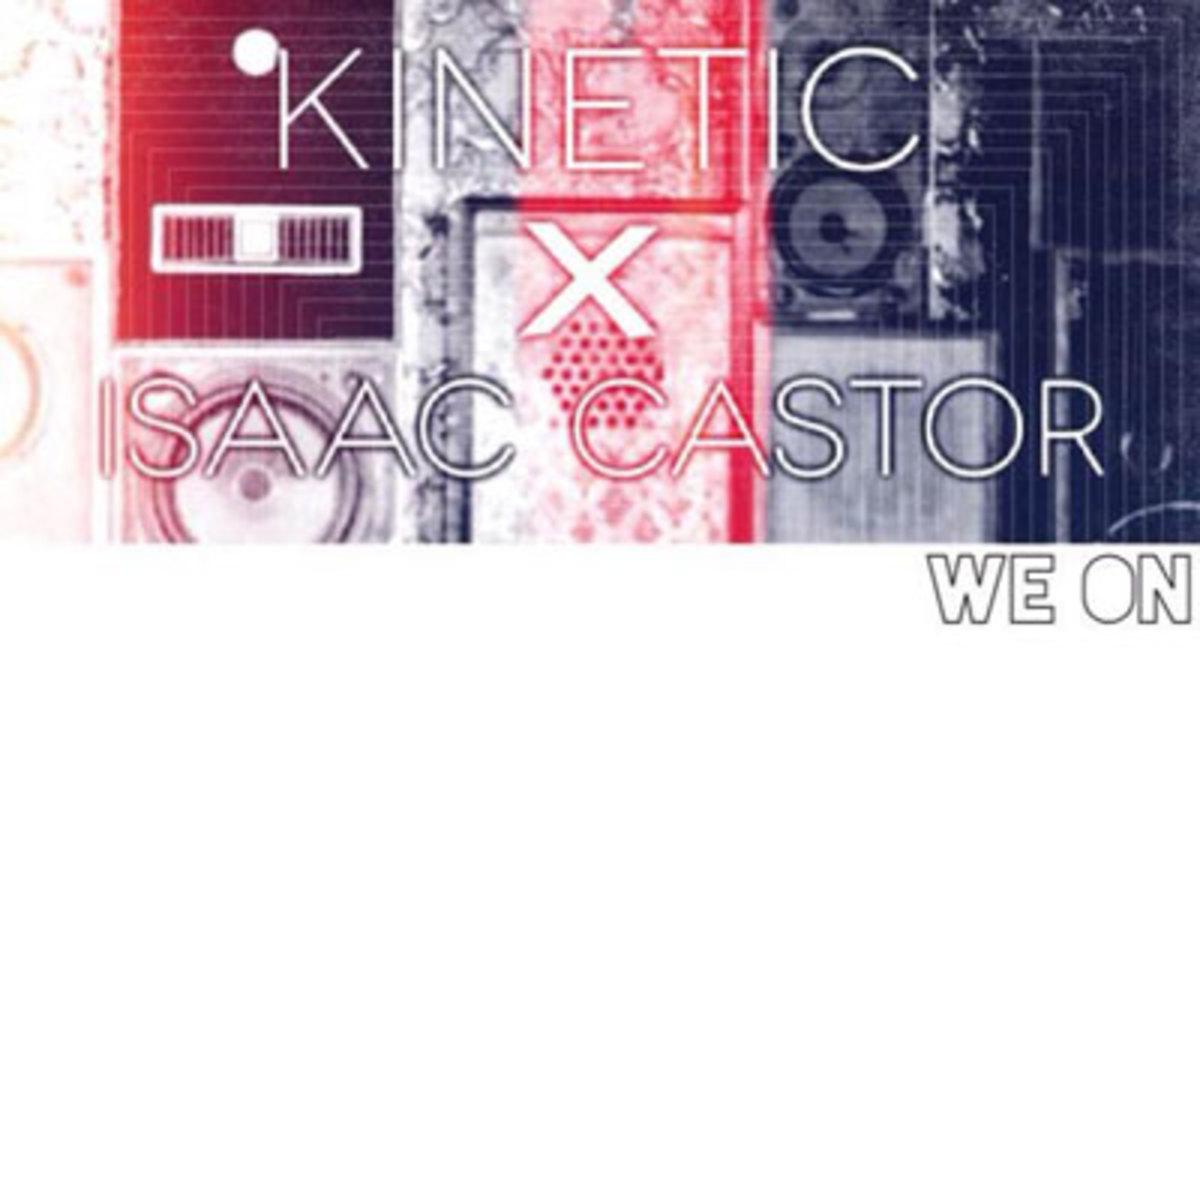 kineticcastor-weon.jpg